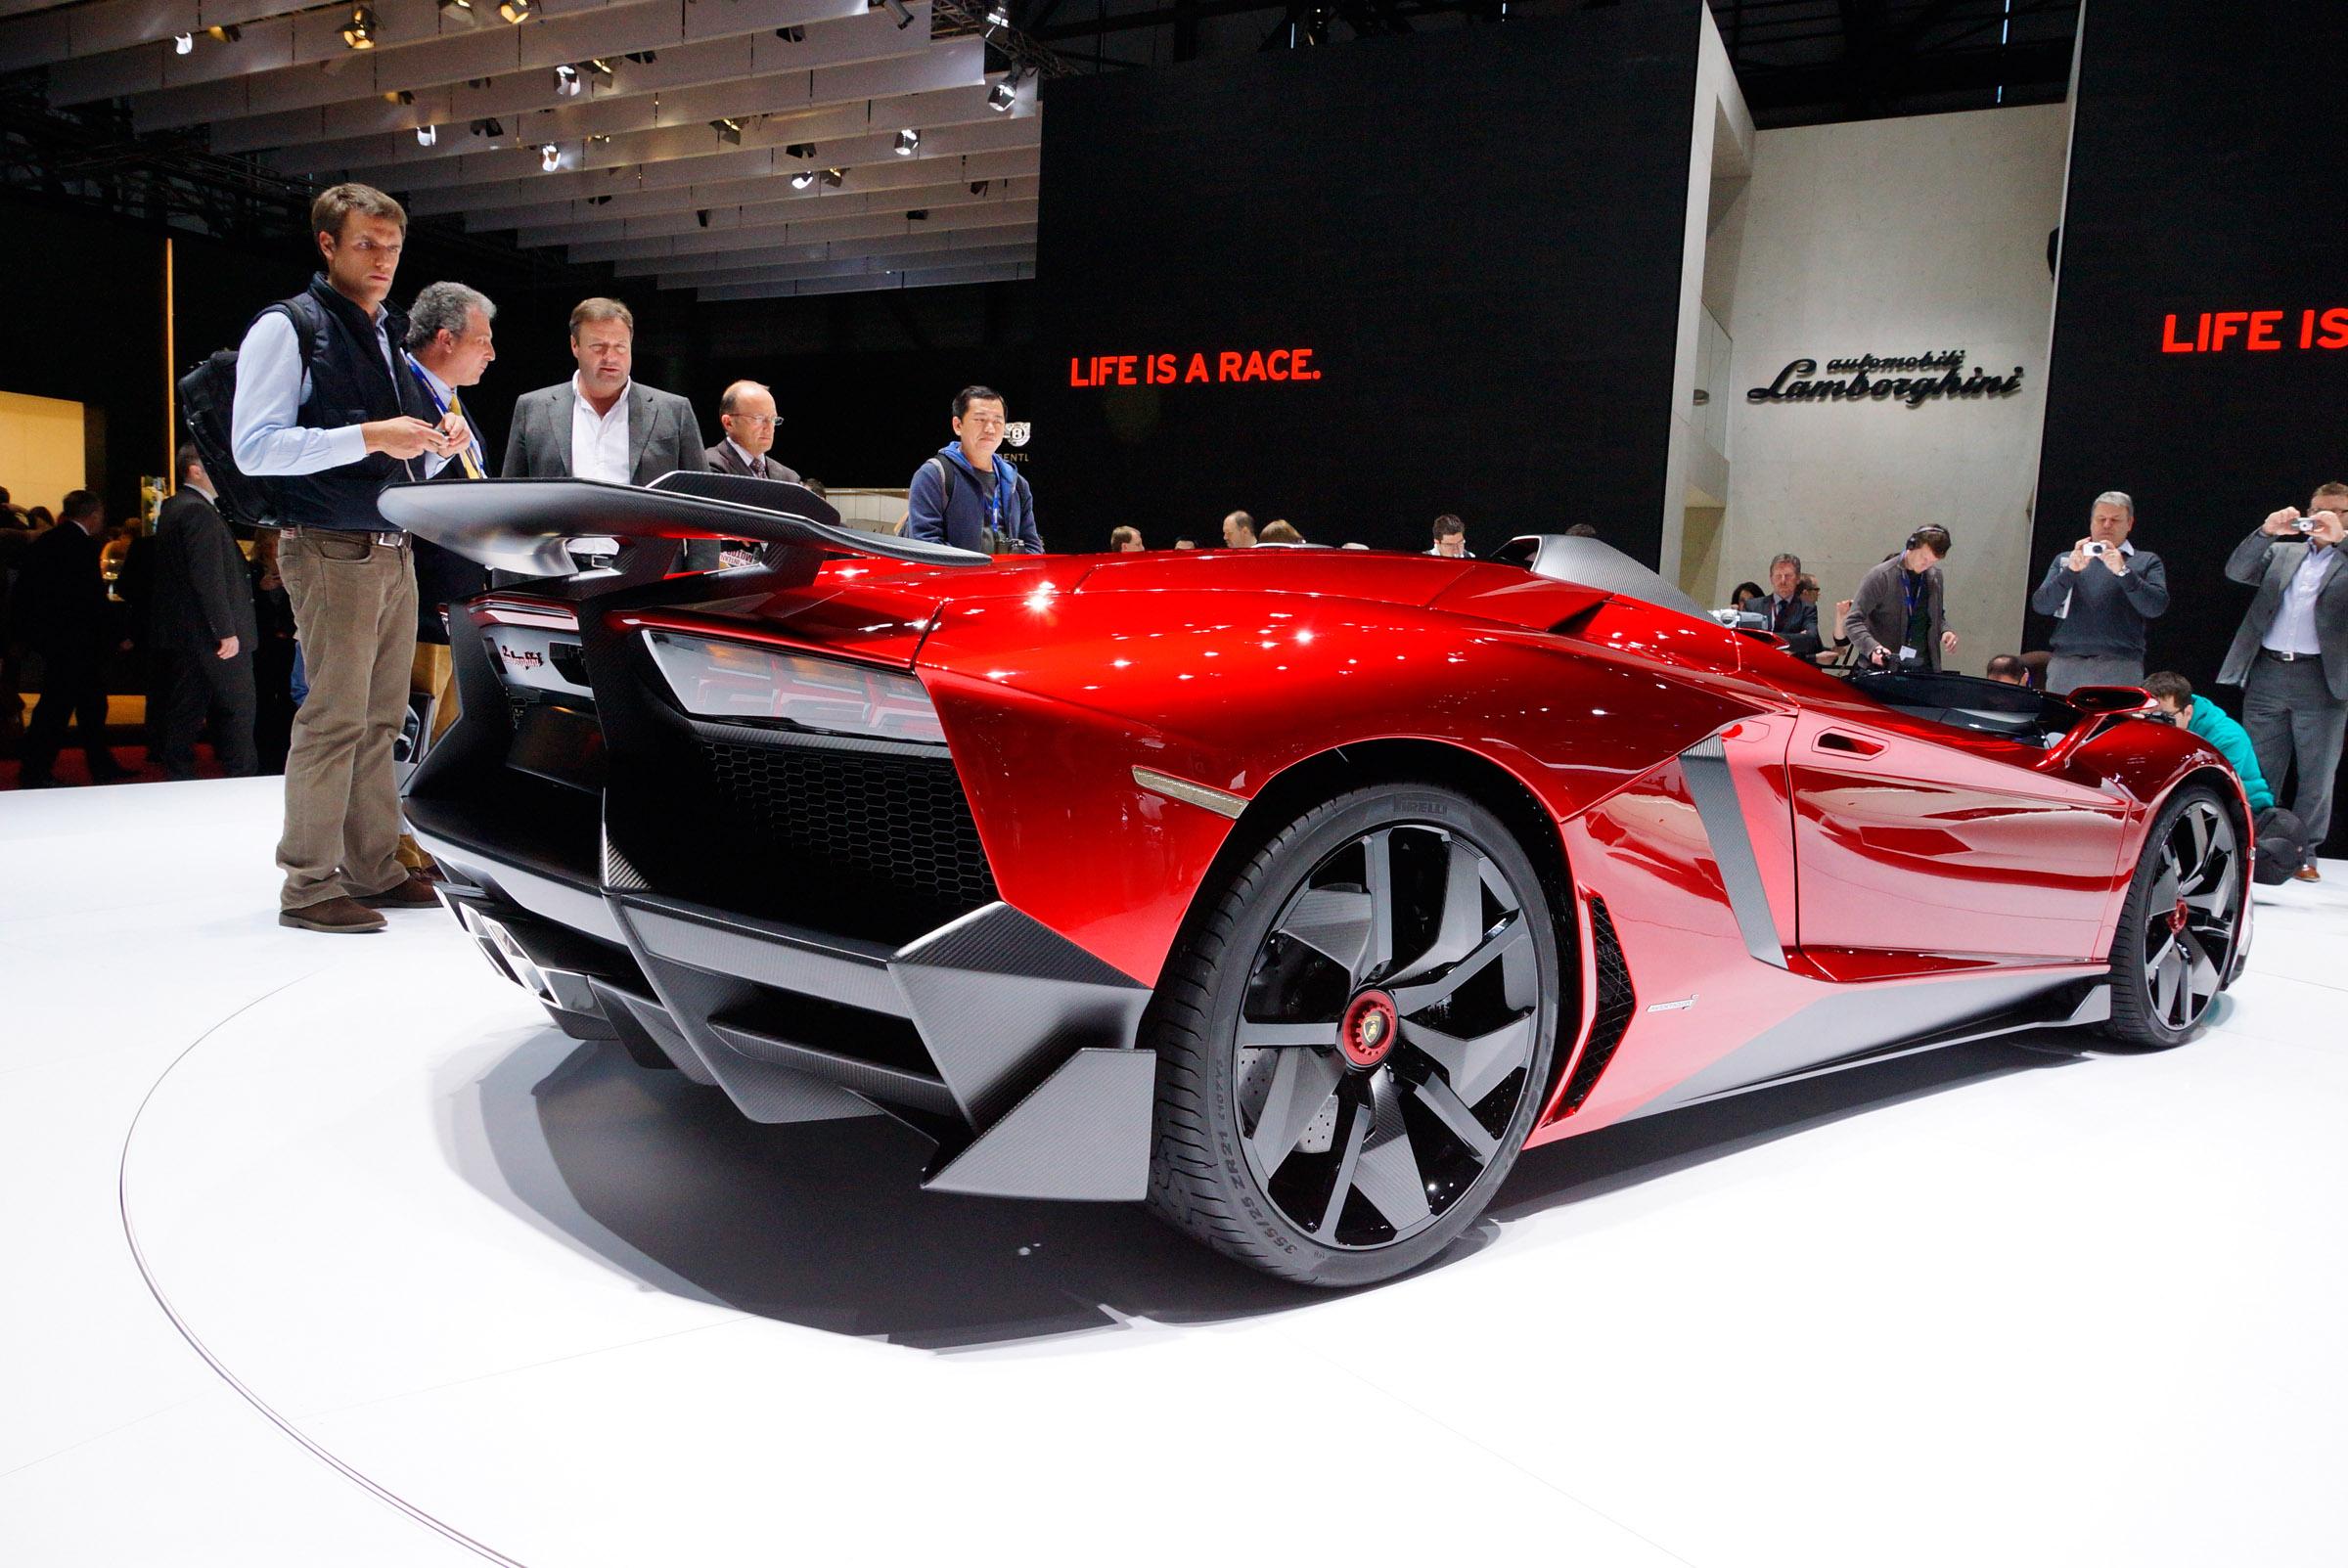 2012 Geneva Motor Show: Lamborghini Aventador J - фотография №8